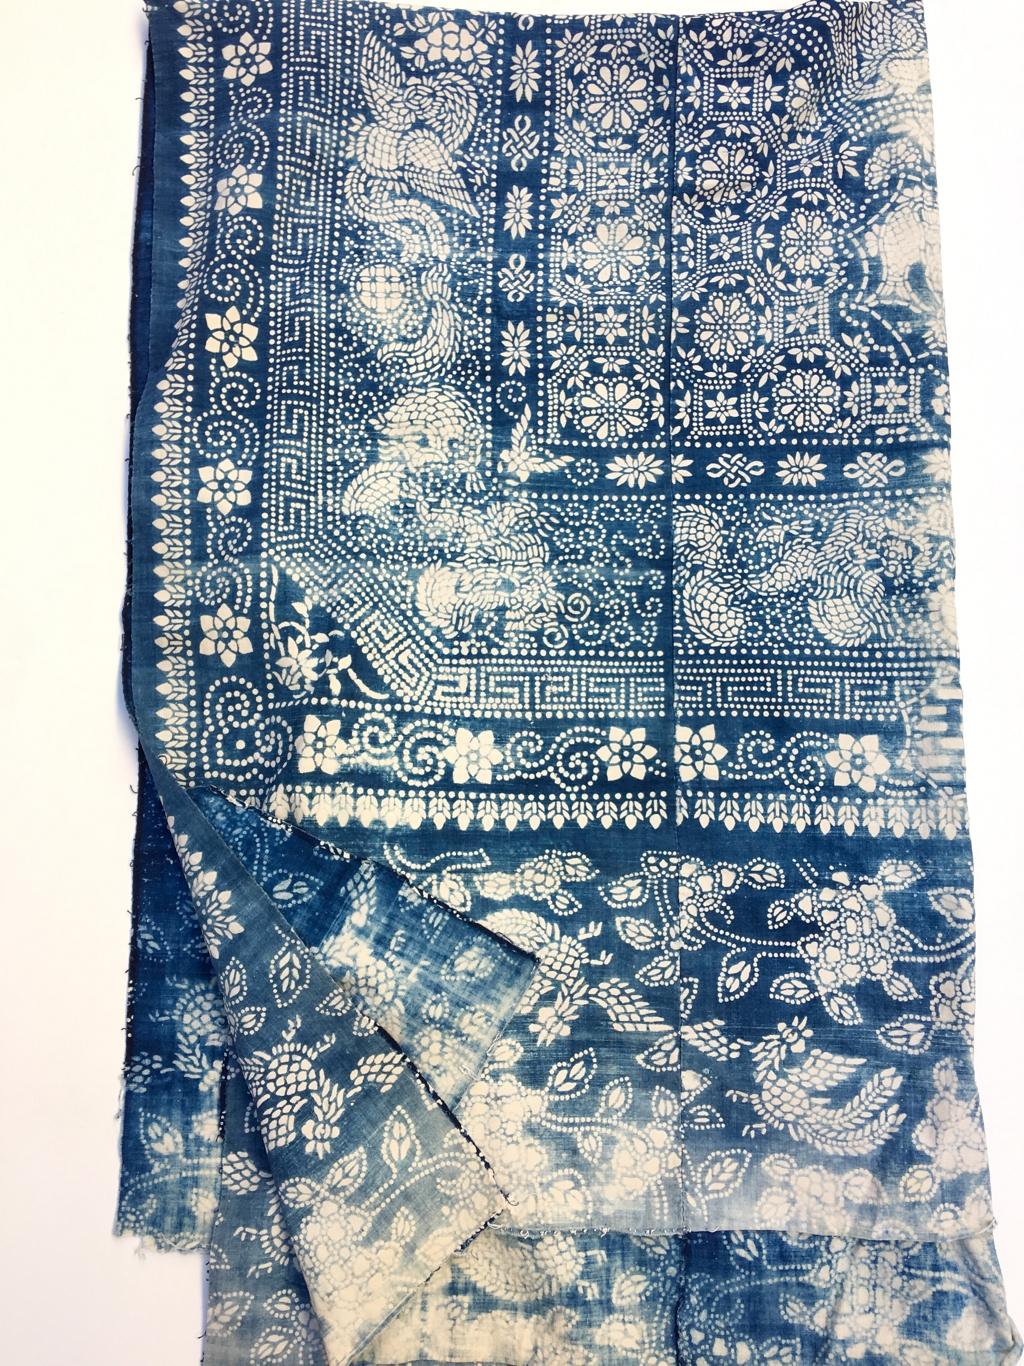 Morrissey Fabric Blog – Morrissey Fabric Throughout 2017 Batik Fabric Wall Art (View 15 of 15)